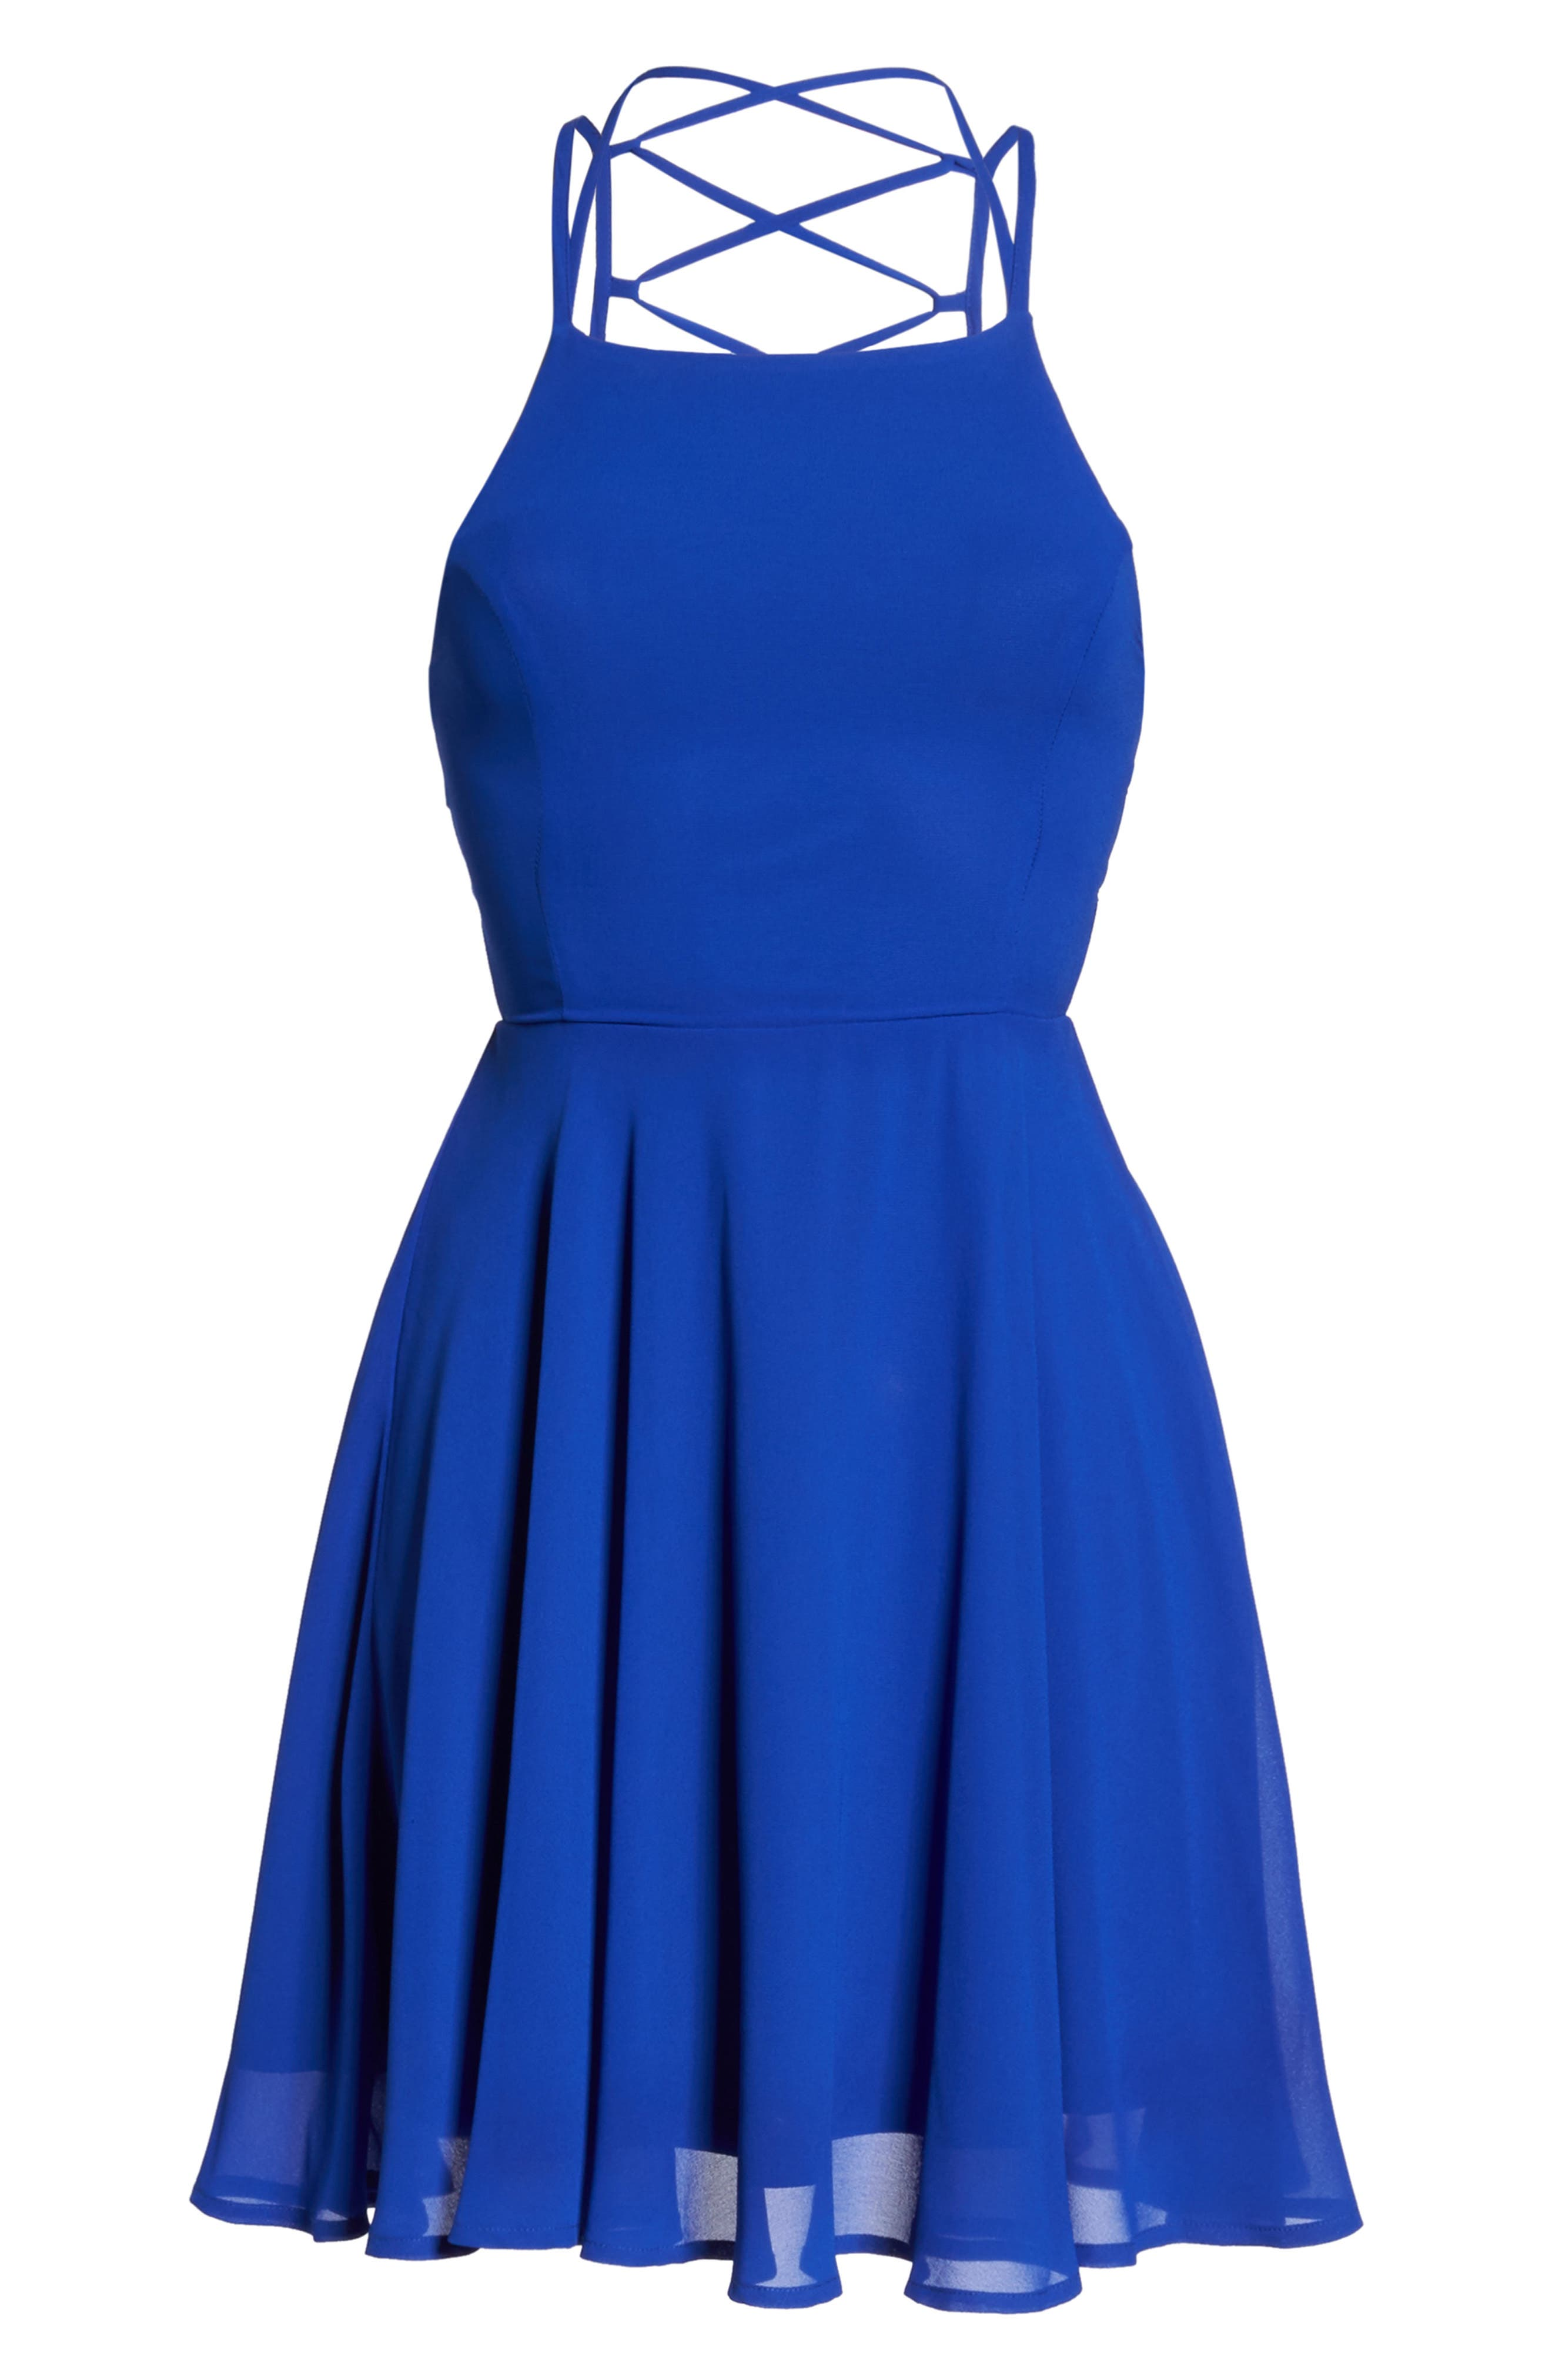 LULUS, Good Deeds Lace-Up Skater Dress, Alternate thumbnail 7, color, ROYAL BLUE